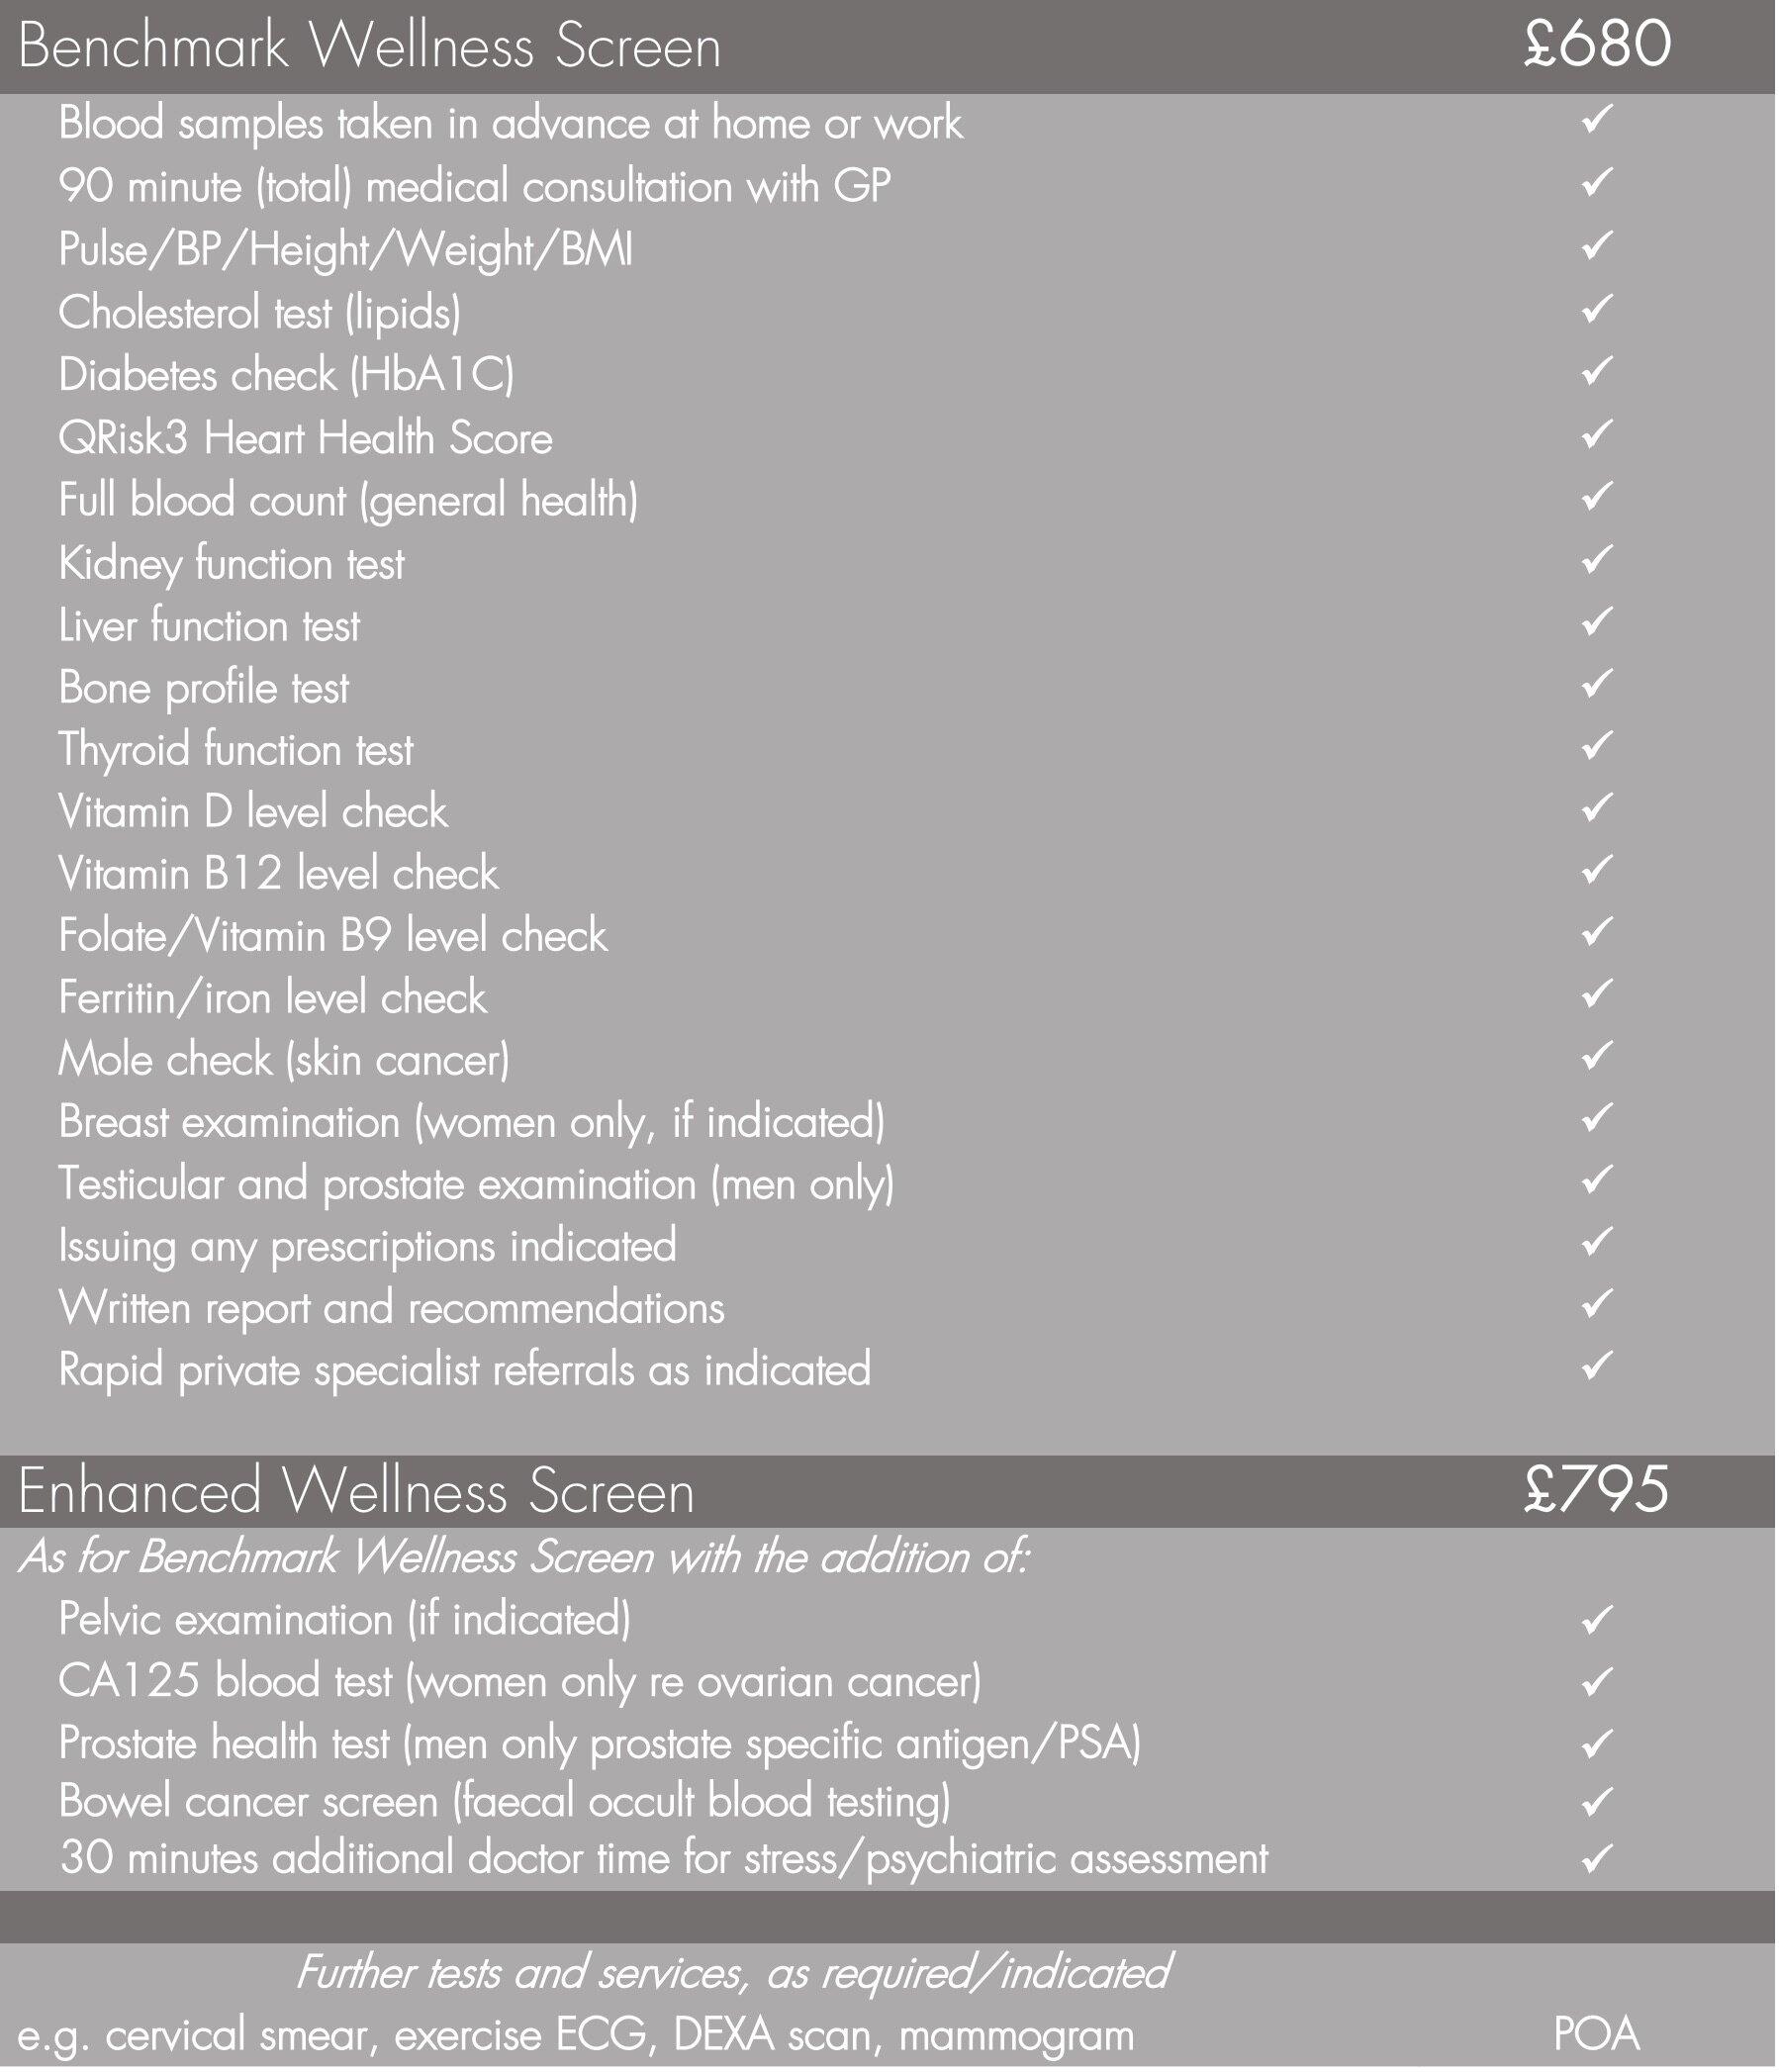 WellnessScreenoutlineforwebsiteincfolateferritin.jpg